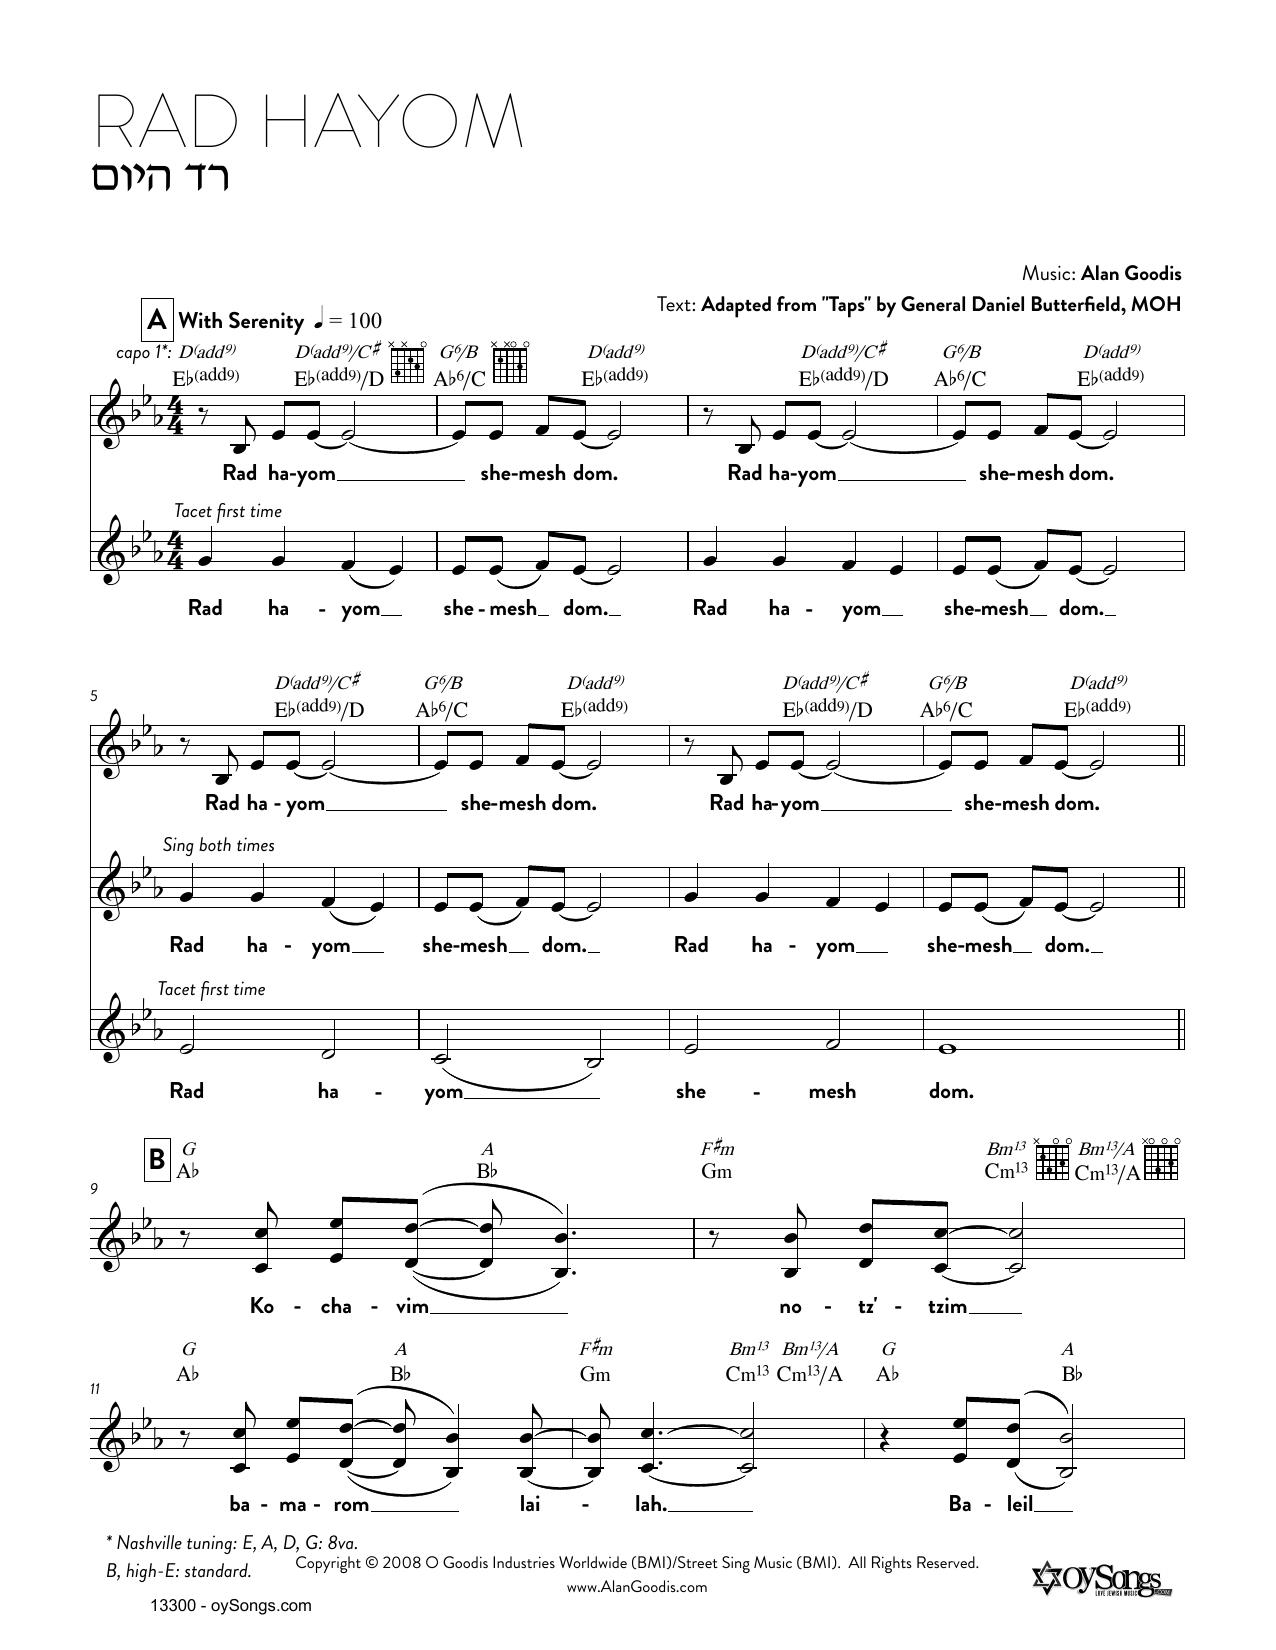 Alan Goodis Rad Hayom sheet music notes and chords. Download Printable PDF.